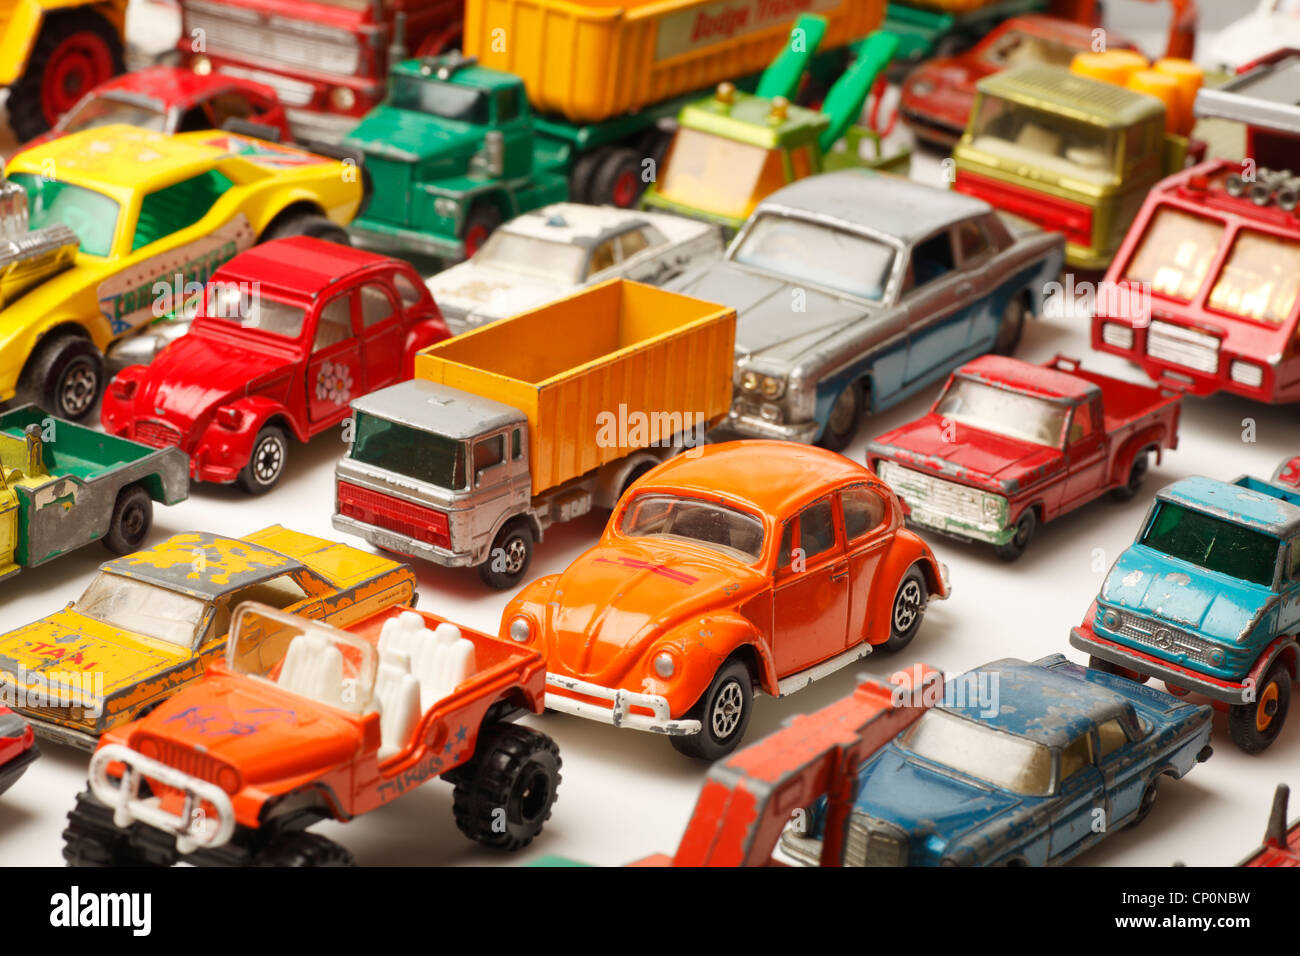 Corgi cars stockfotos bilder alamy